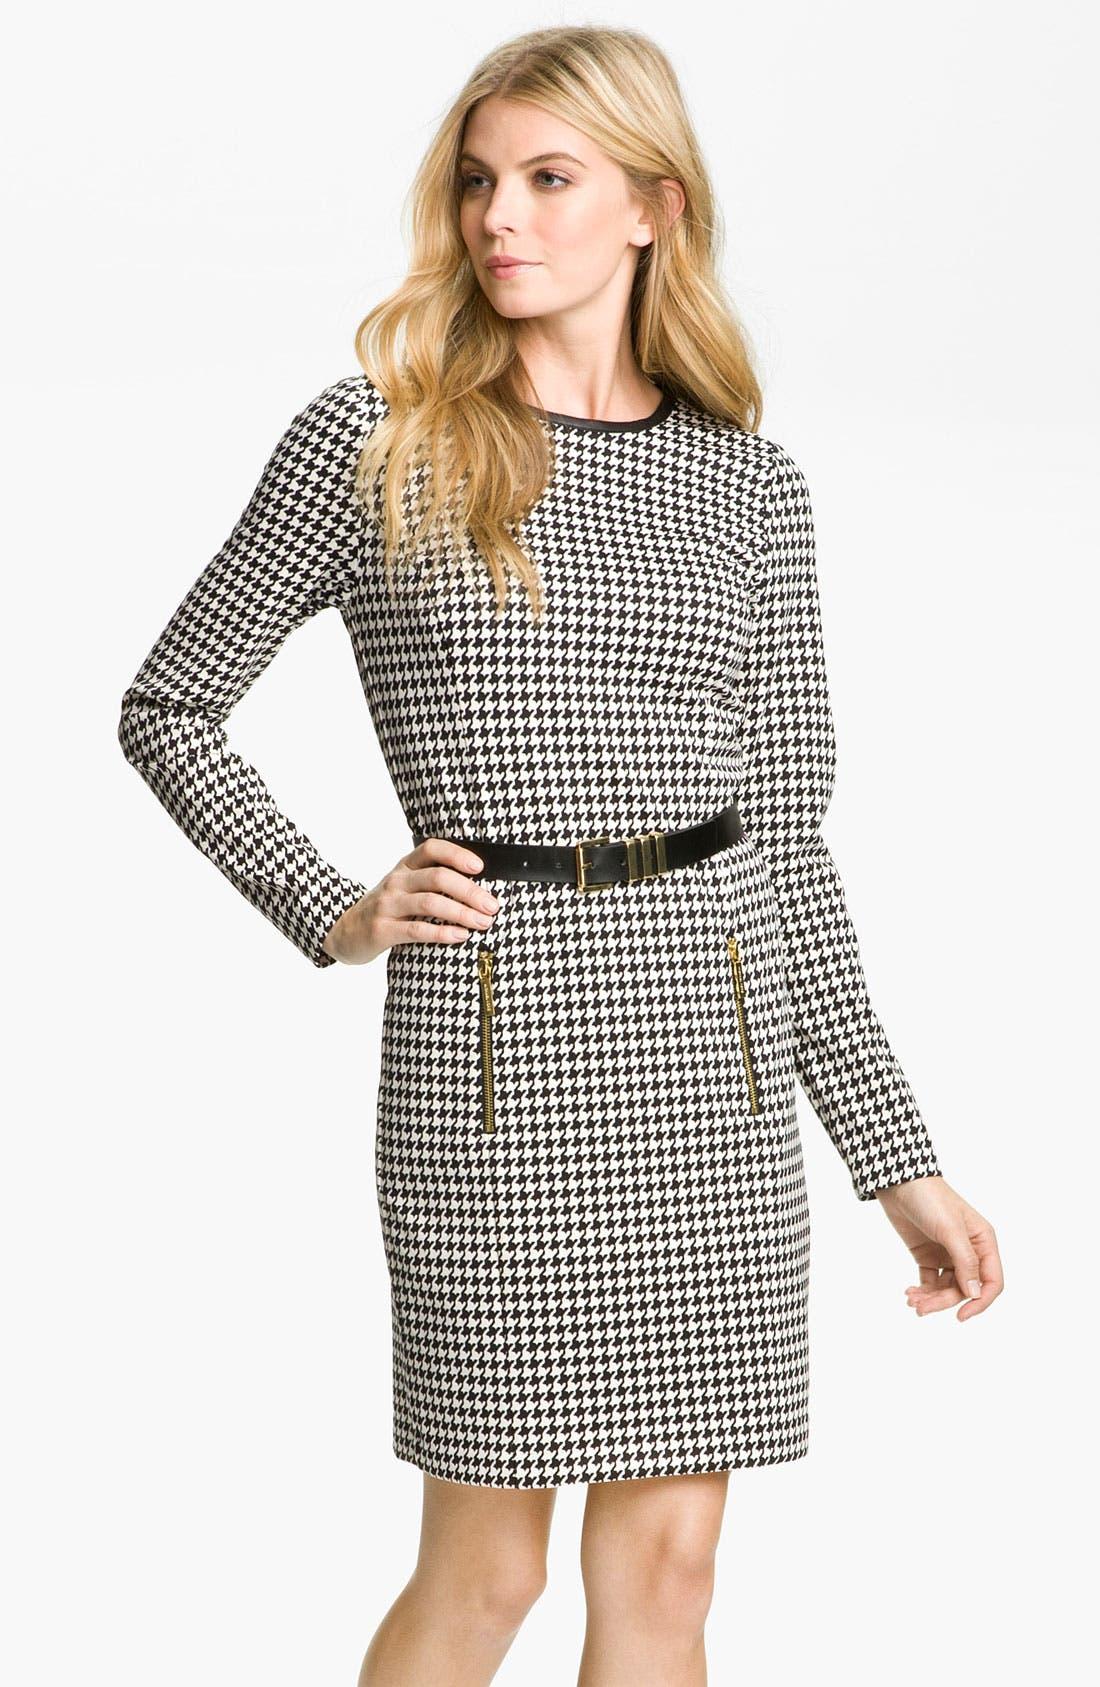 Alternate Image 1 Selected - MICHAEL Michael Kors Leather Trim Dress (Petite)